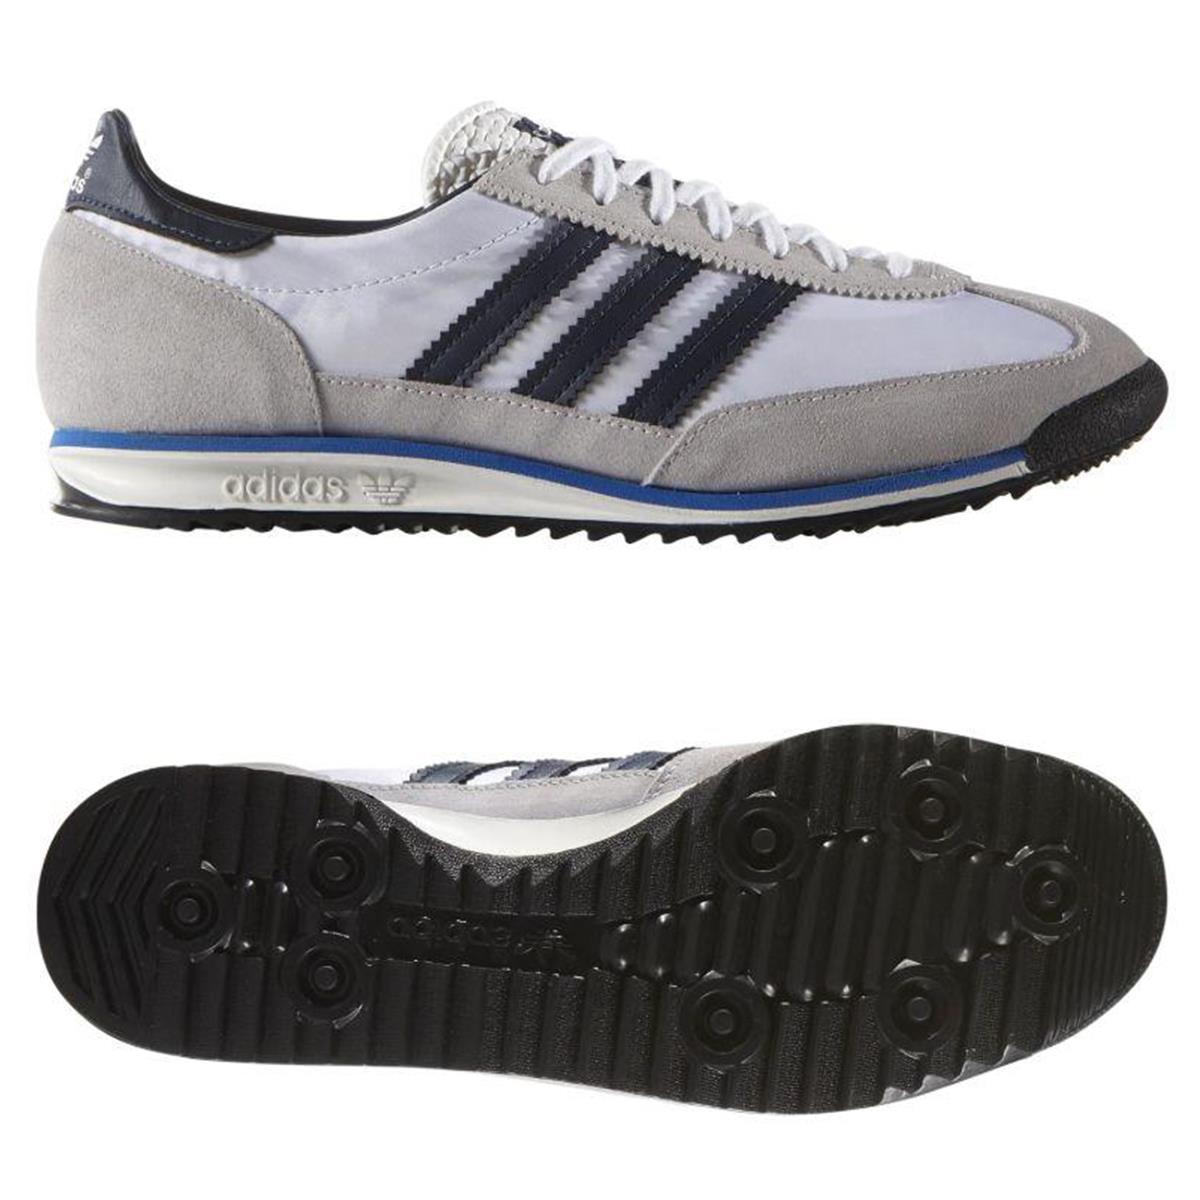 adidas ORIGINALS MEN/'S SL 72 BLACK NAVY WHITE SNEAKERS SHOES VINTAGE TRAINERS